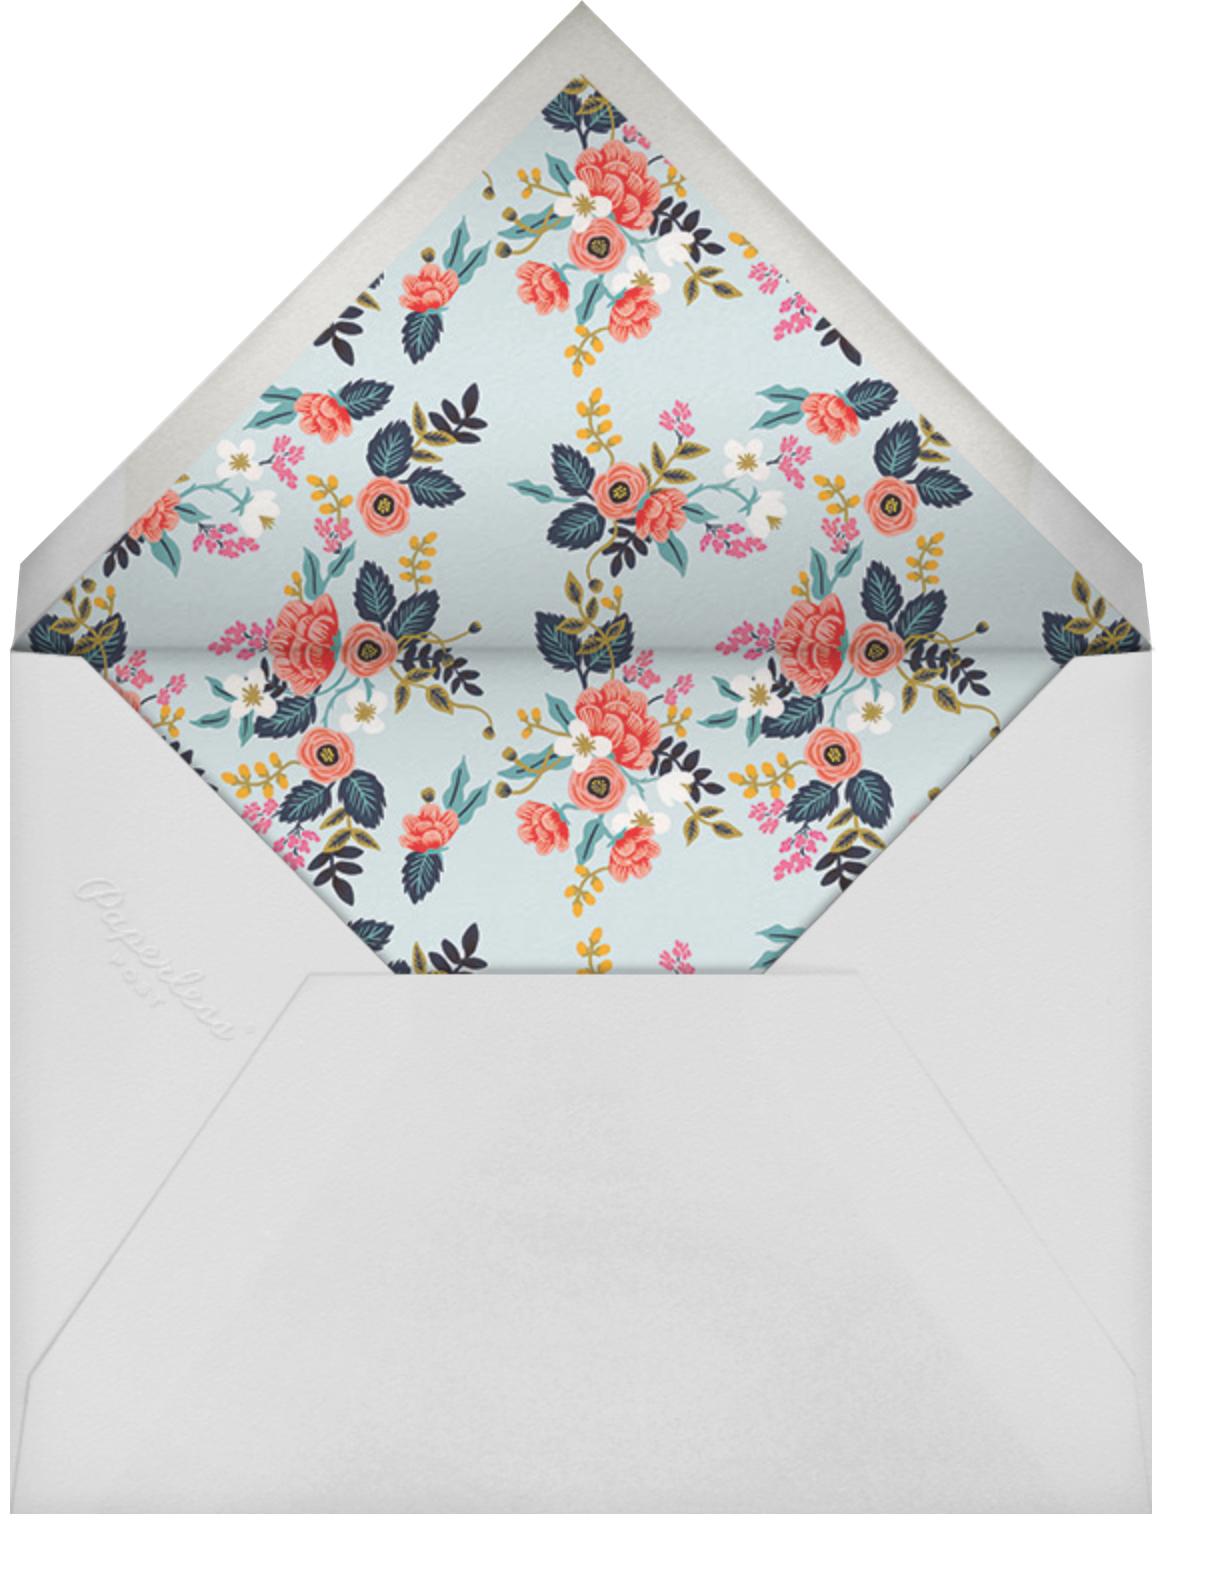 Birch Monarch (Frame) - Ivory - Rifle Paper Co. - Graduation party - envelope back